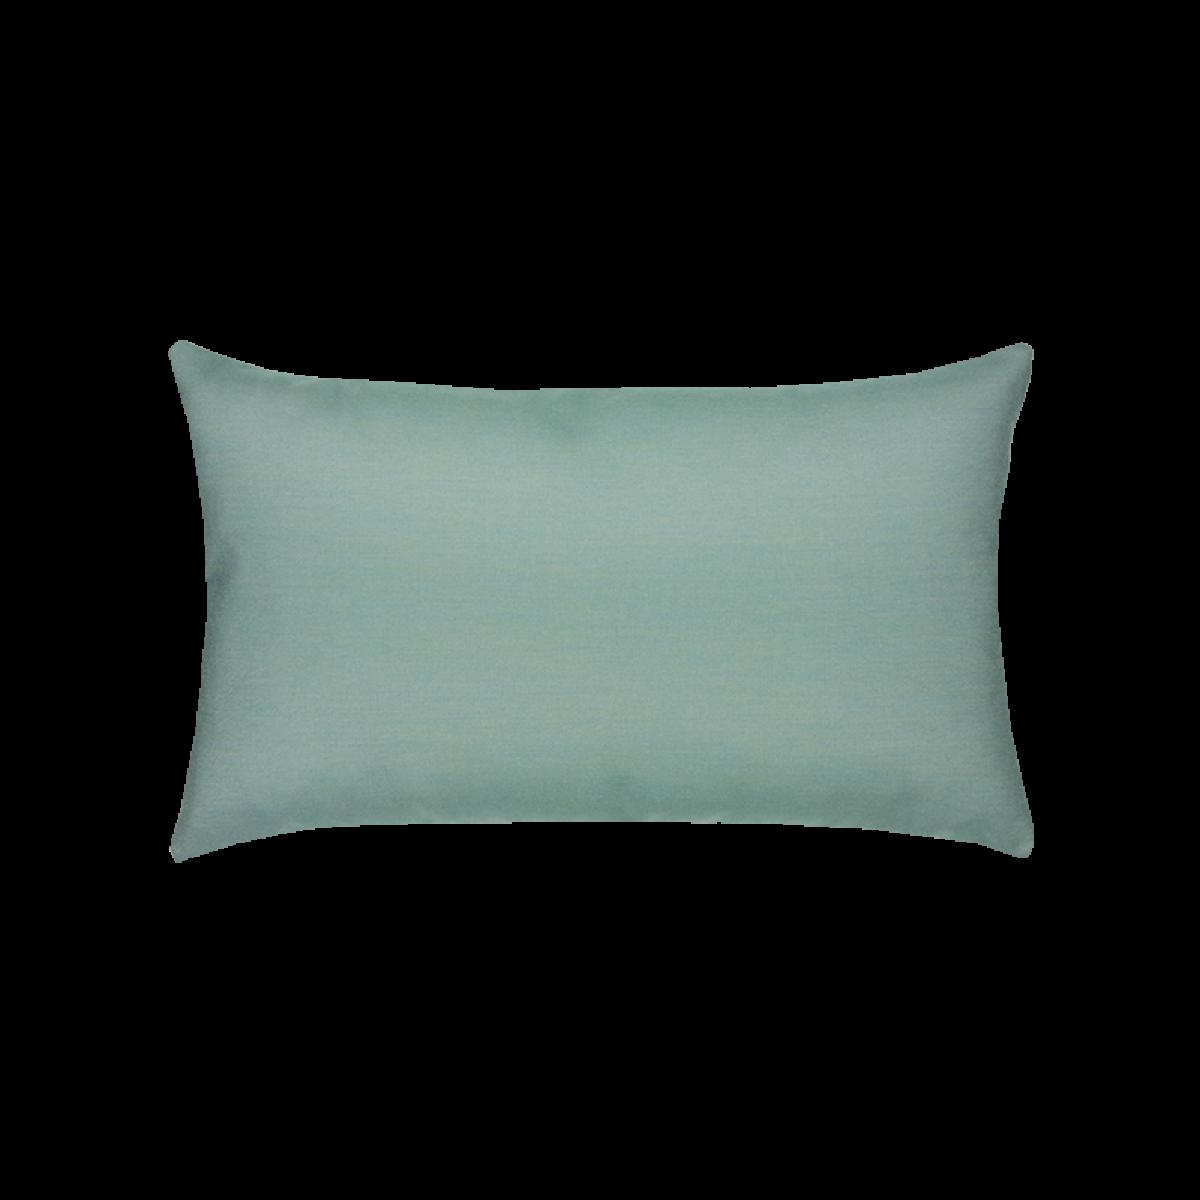 Canvas Spa Essentials Lumbar Pillow